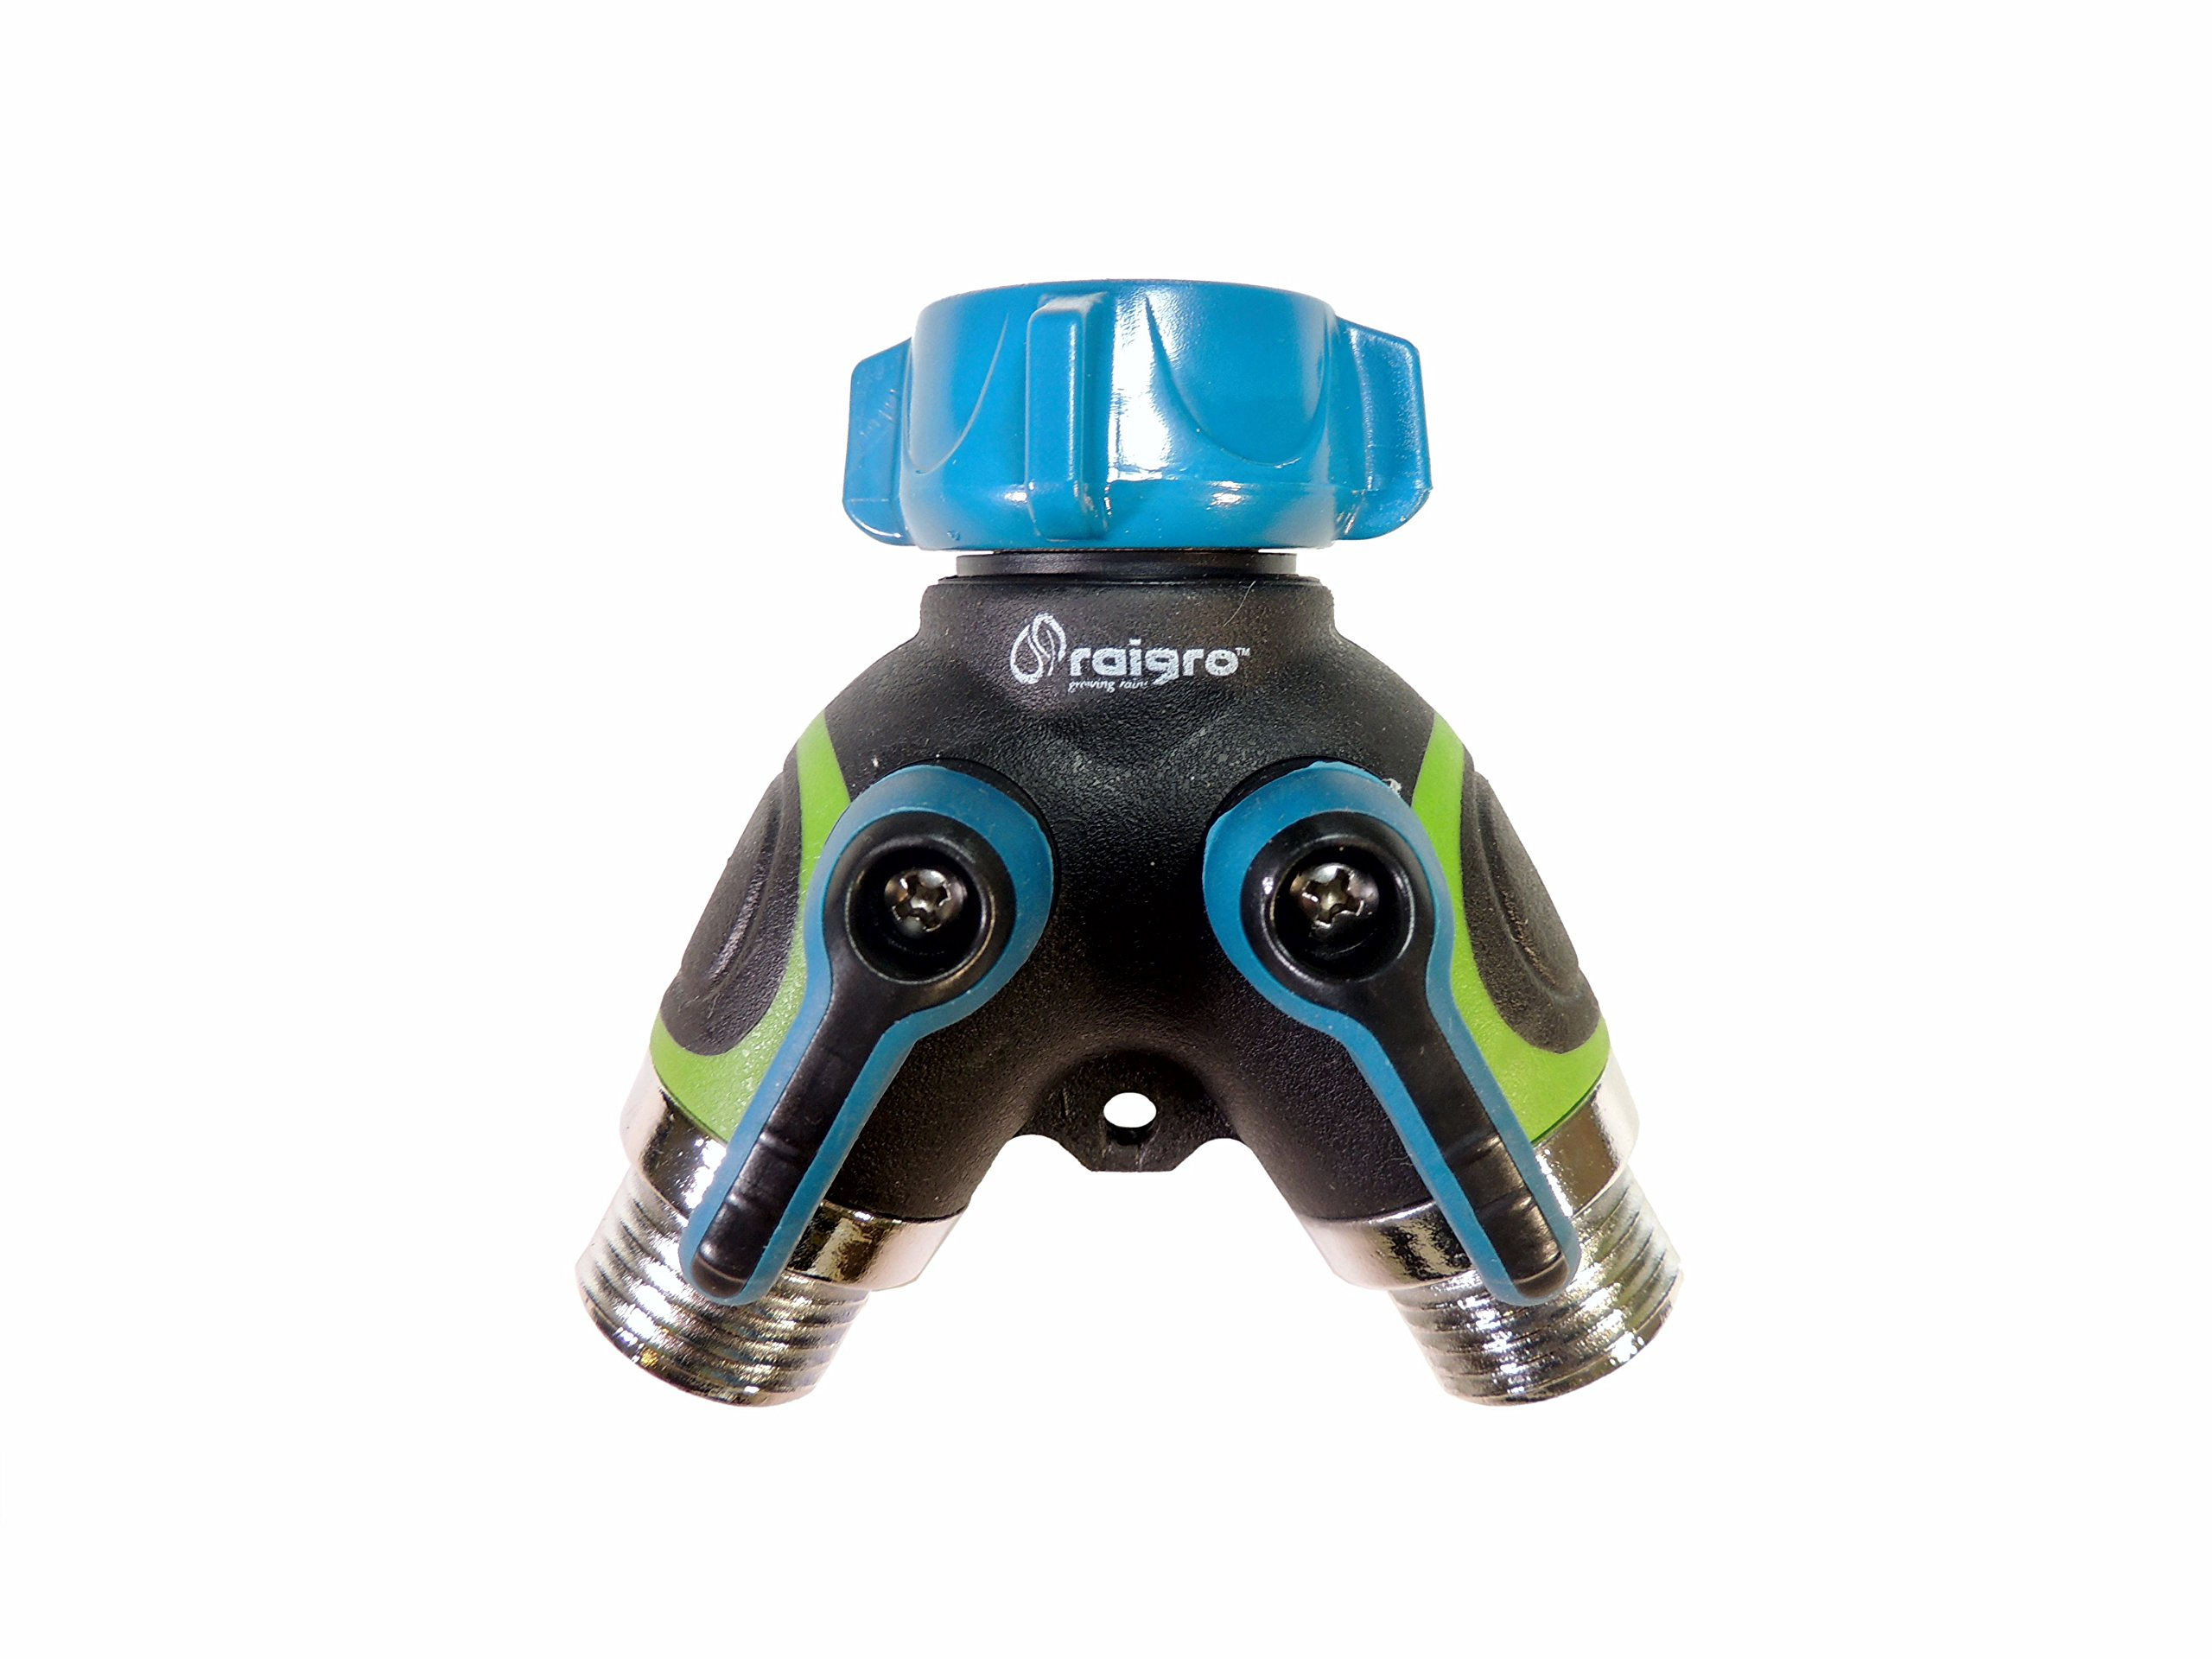 Raigro Garden Hose Splitter - Rugged, Easy Grip 2 Way Hose Connector